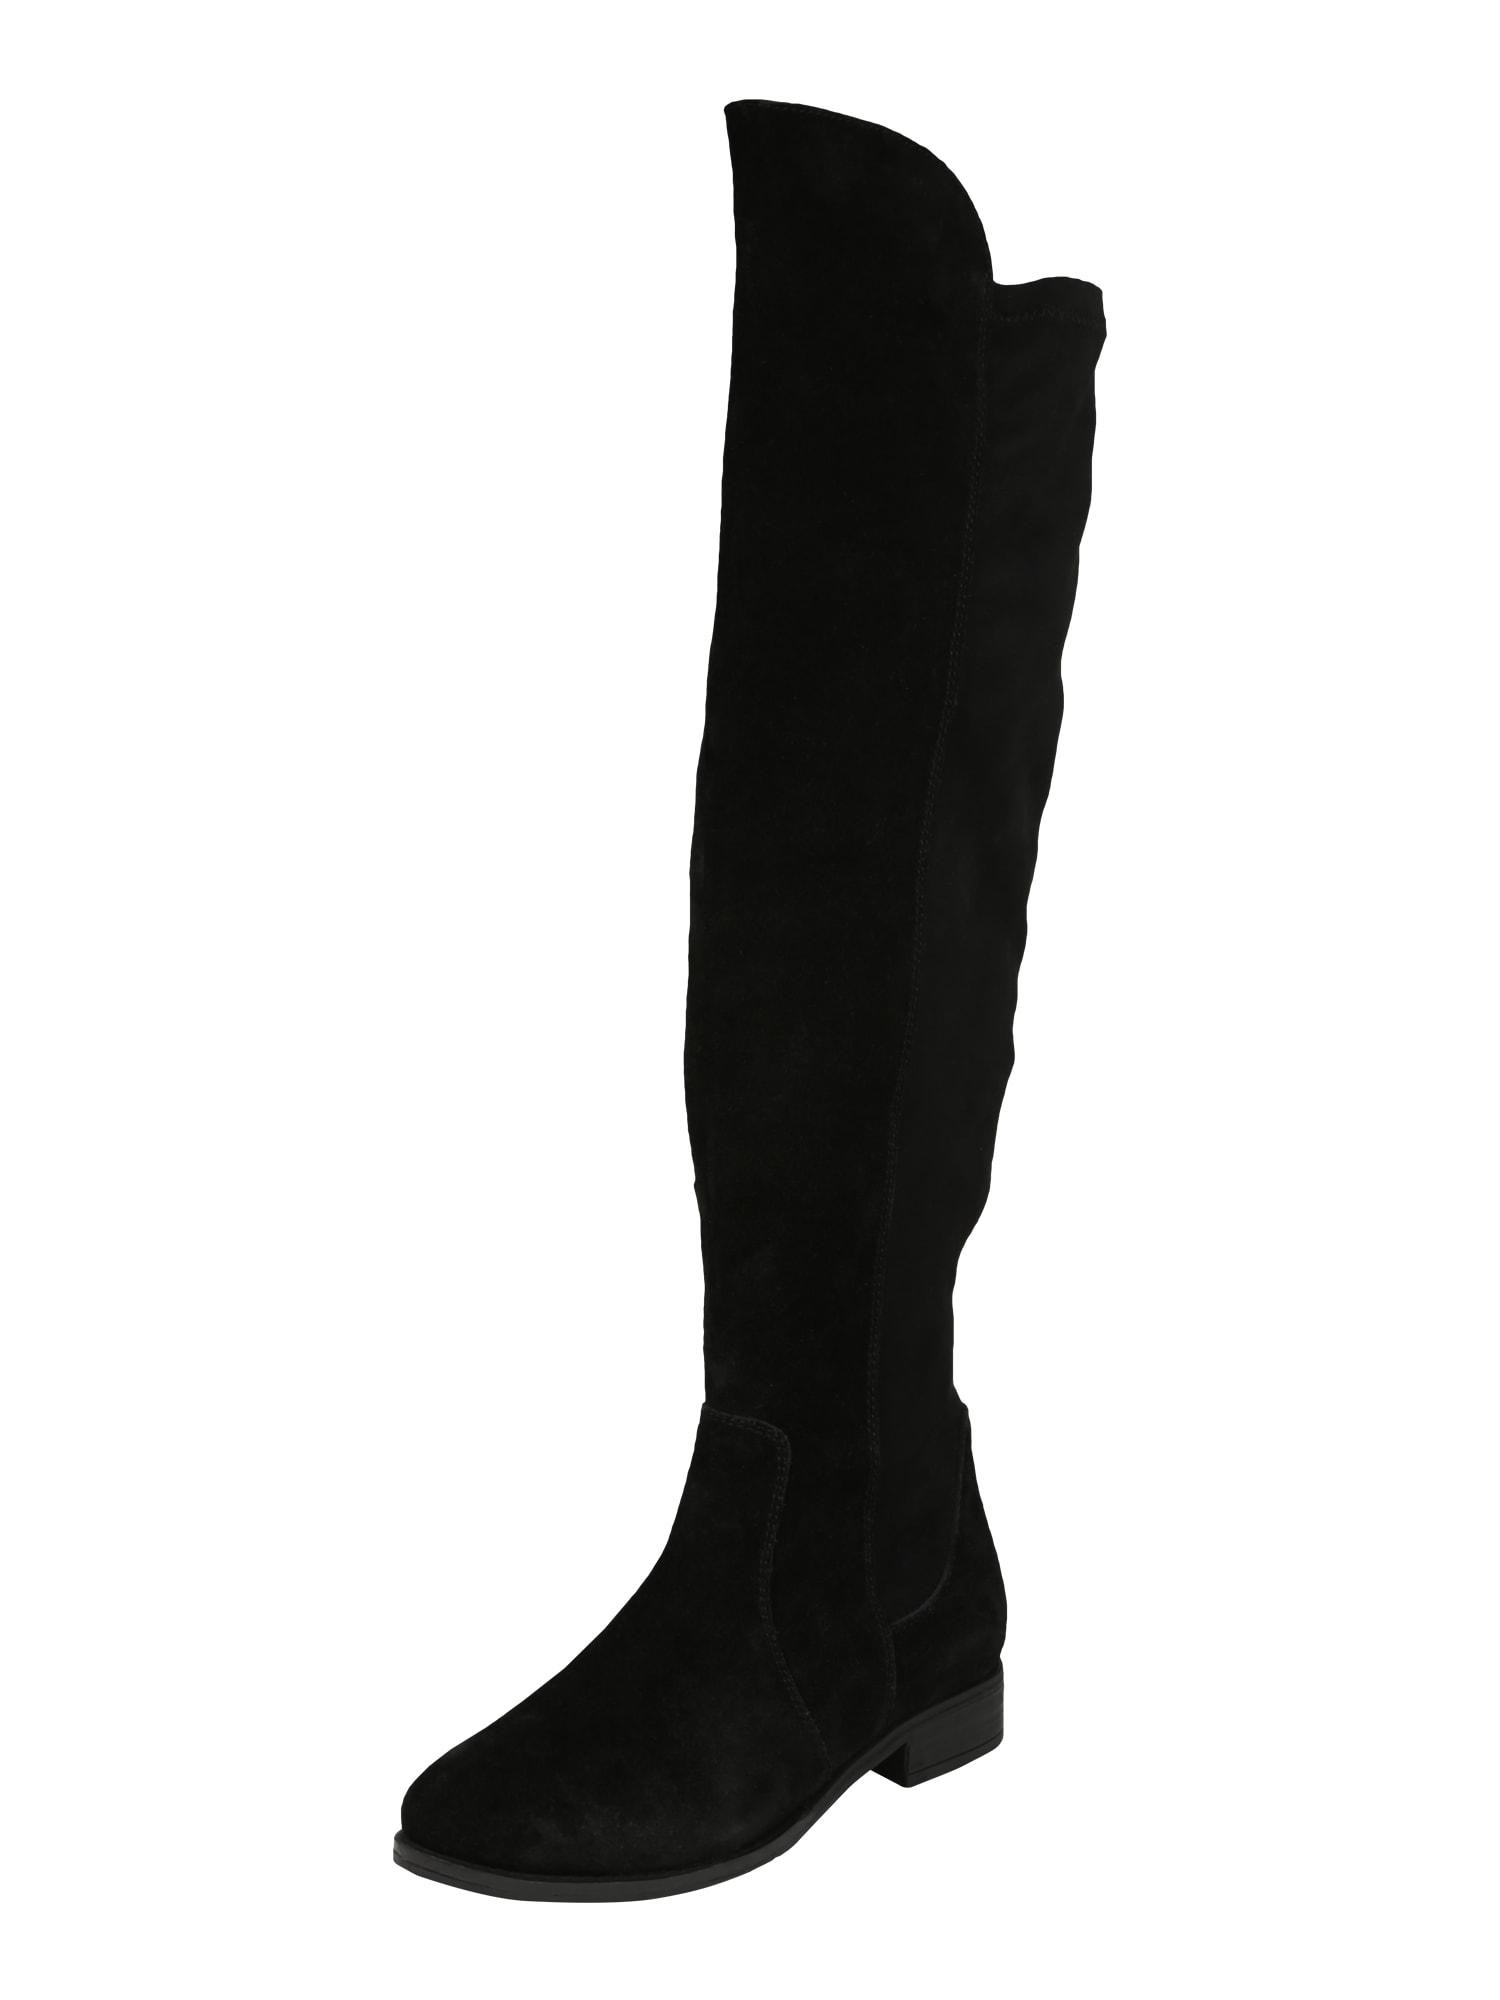 ABOUT YOU, Dames Overknee laarzen 'Carolina', zwart